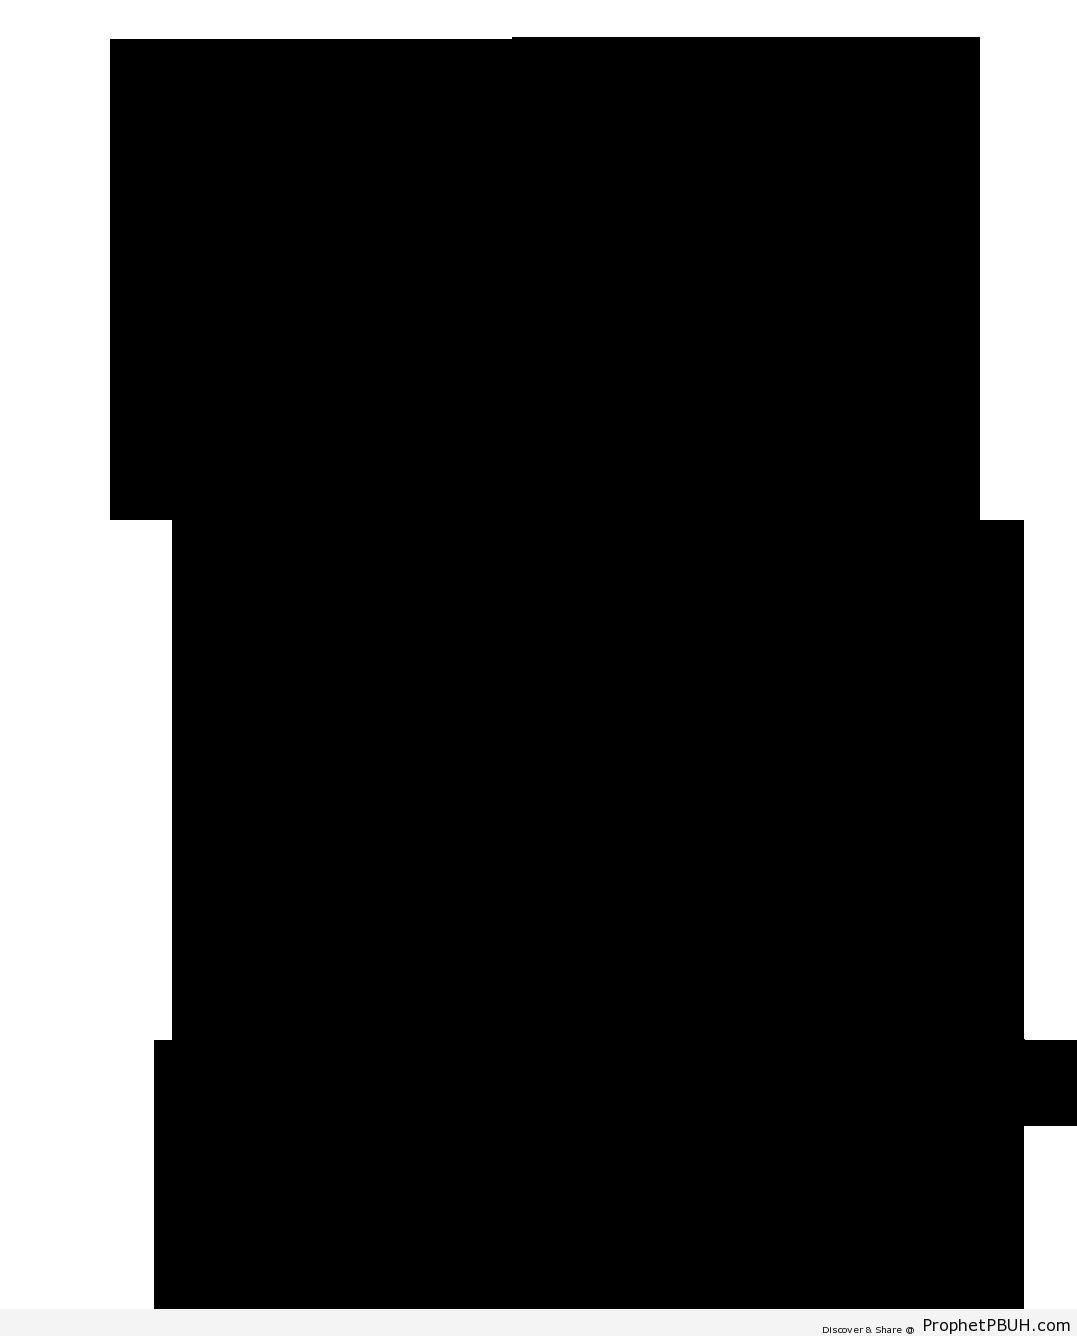 Ibn al-Haytham (Alhazen) - Drawings